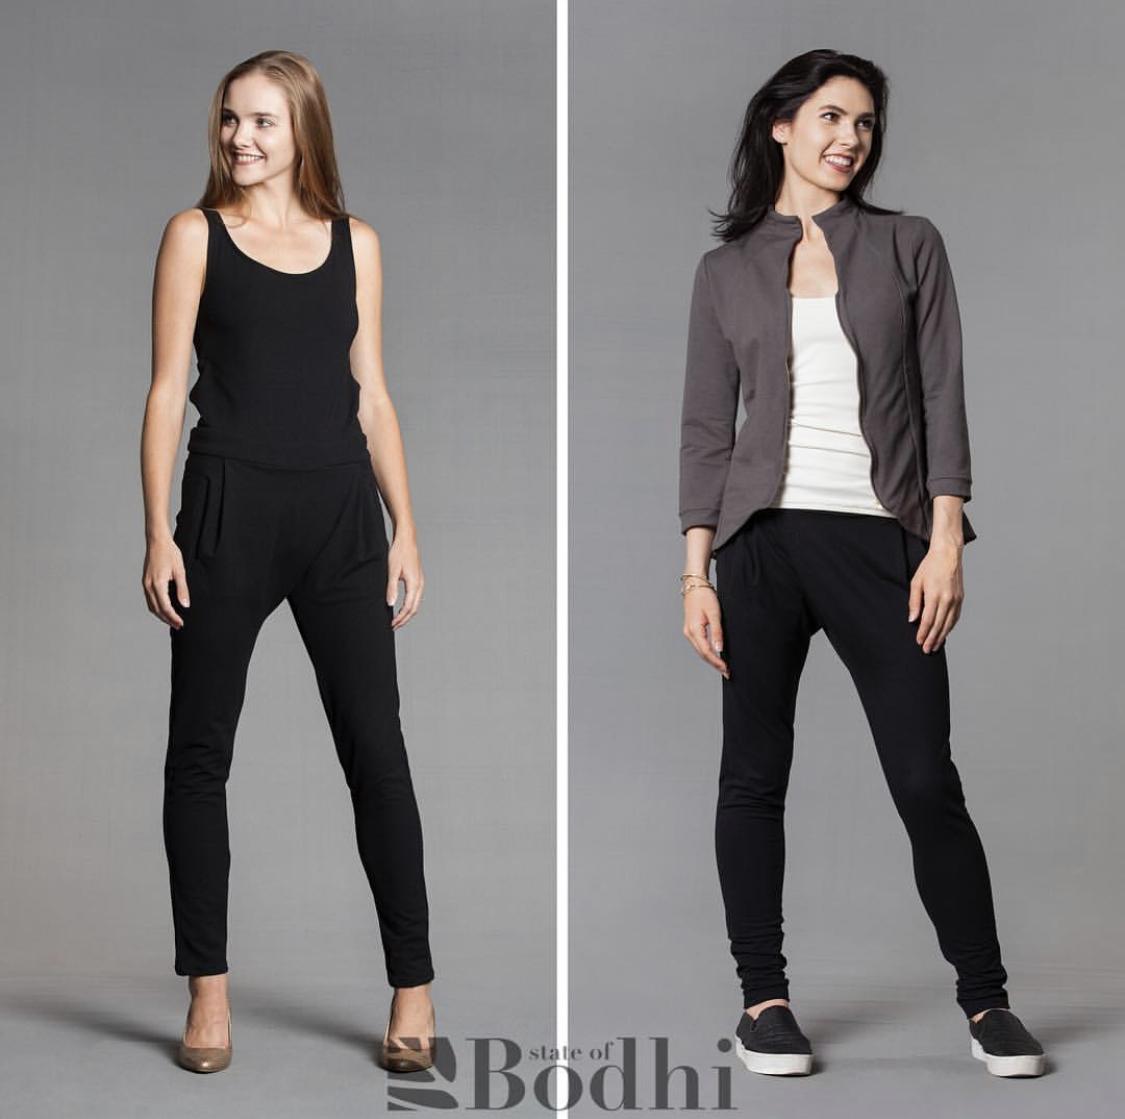 Paige Tilton & Beckanne Sisk in State of Bodhi